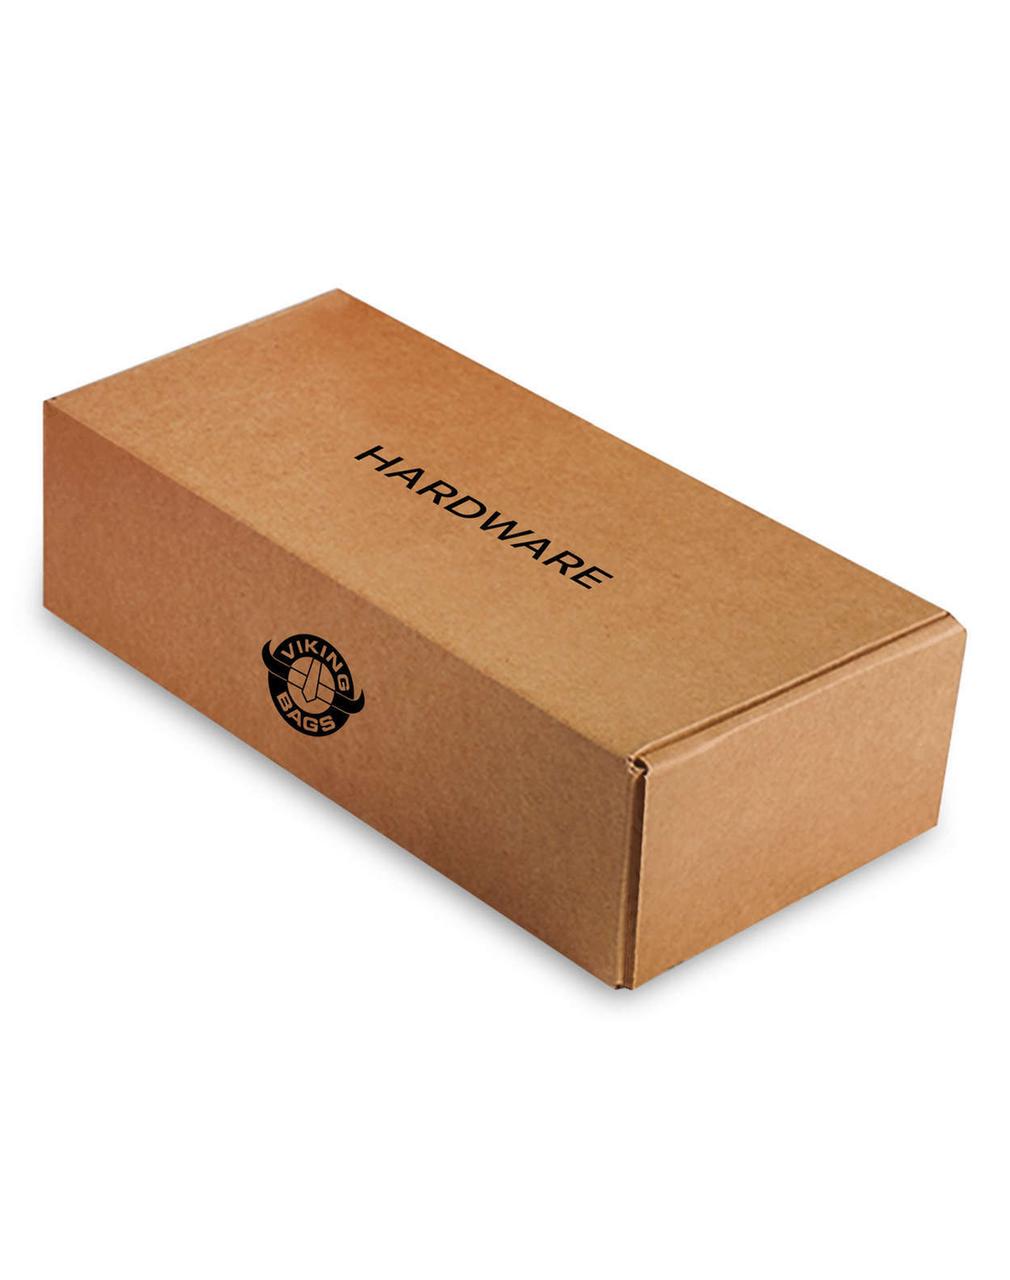 Honda 1500 Valkyrie Standard Warrior M Motorcycle saddlebags Box